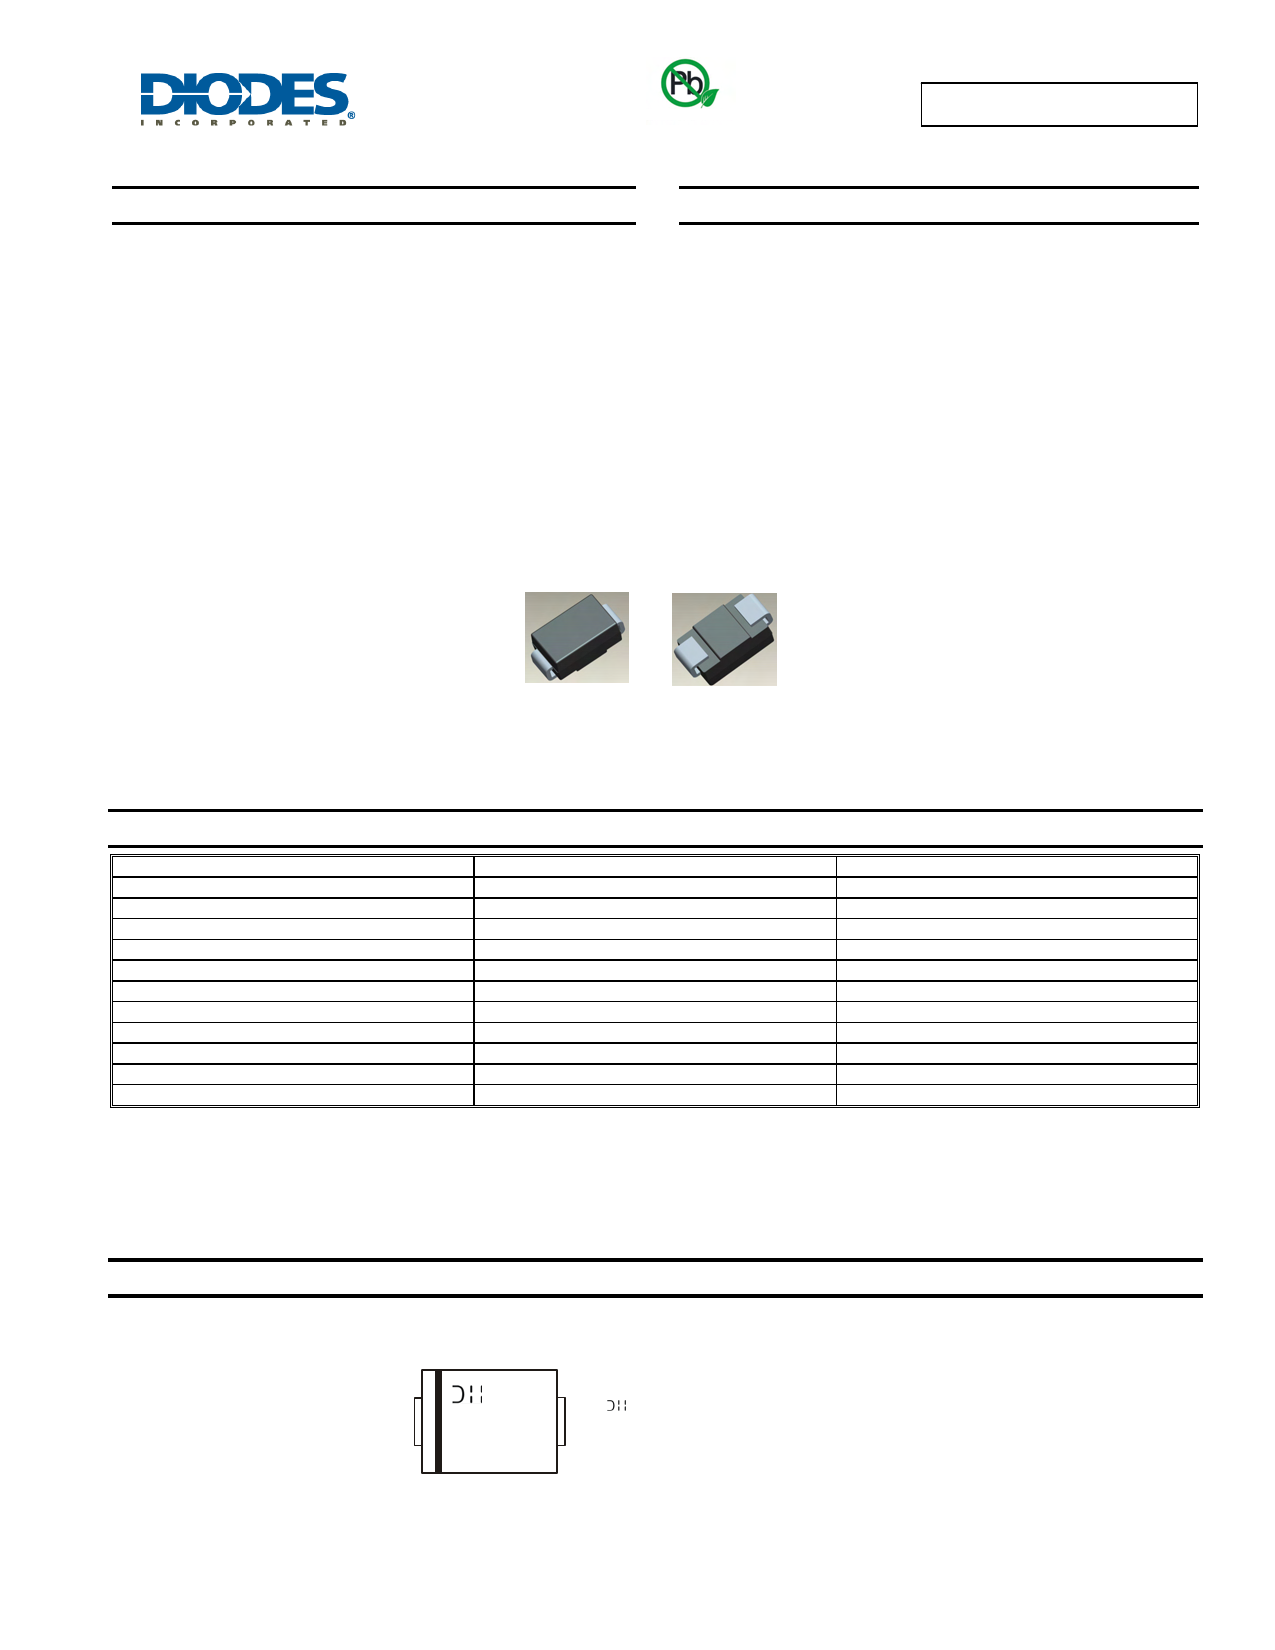 TB2300M datasheet